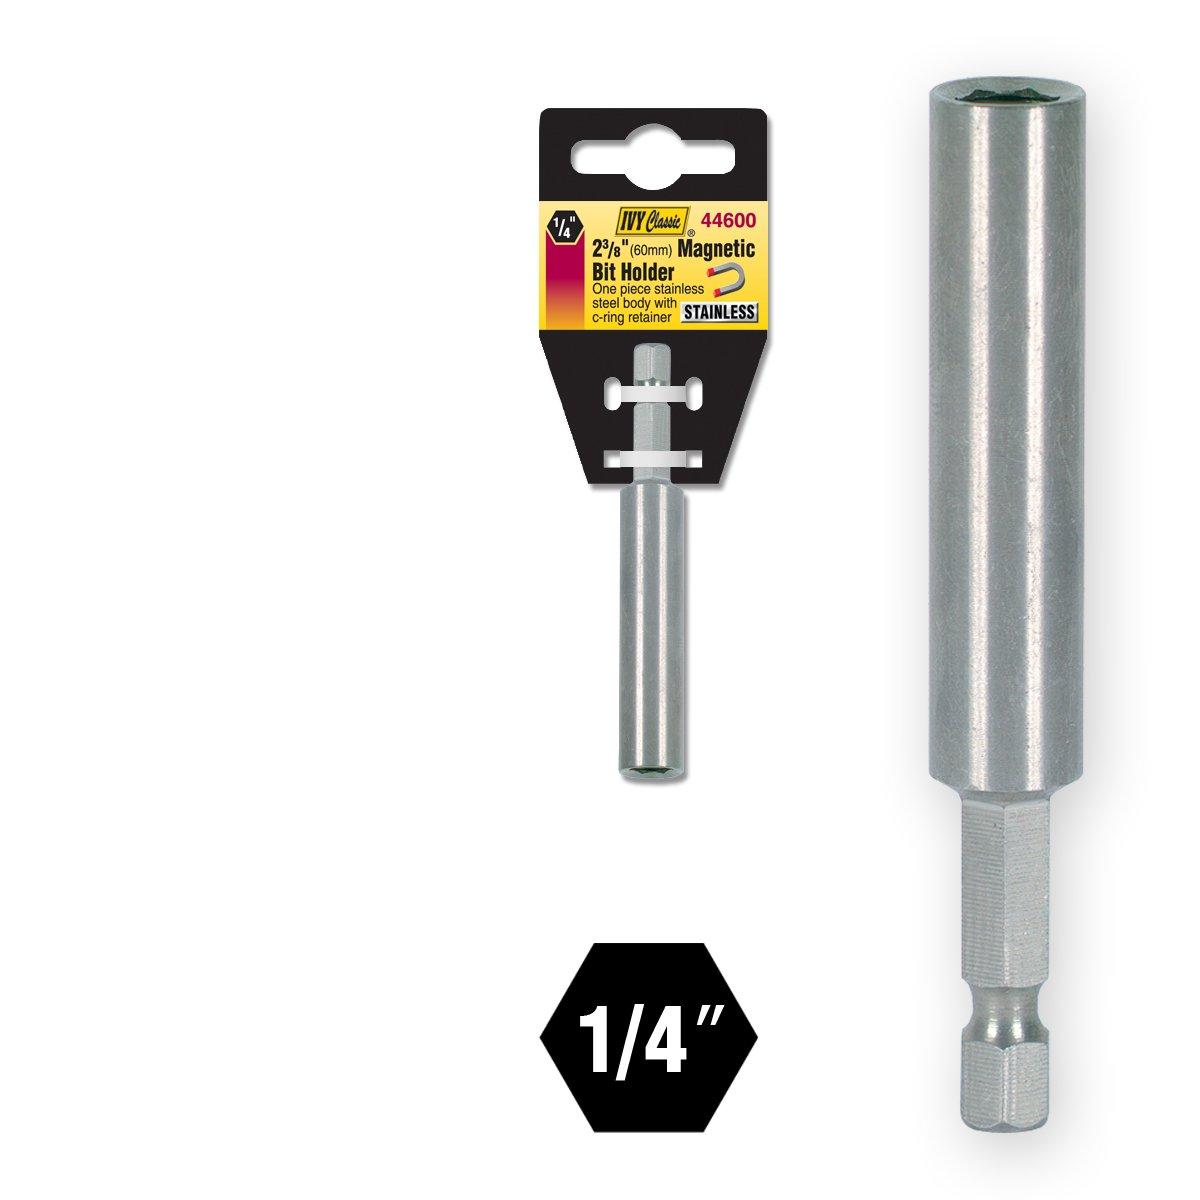 IVY Classic 44600 1//4 x 2-3//8 Hex Magnetic Bit Holder Impact Plus 1//Card